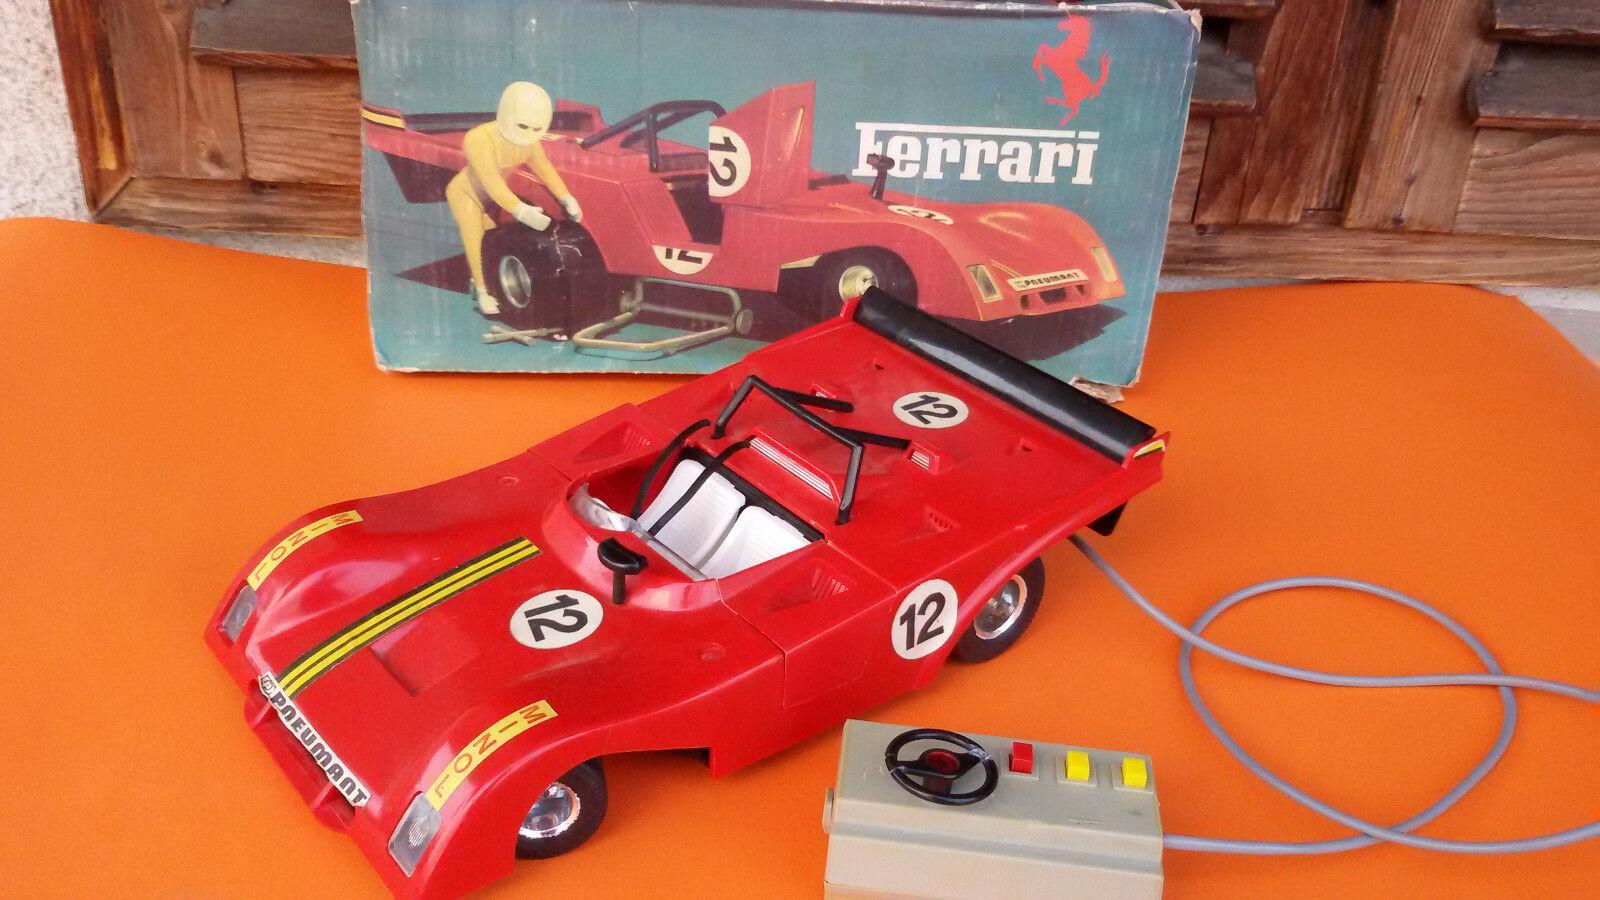 Vintage Rare Germany Piko Toy Ferari 312 Racing Car Toy + BOX